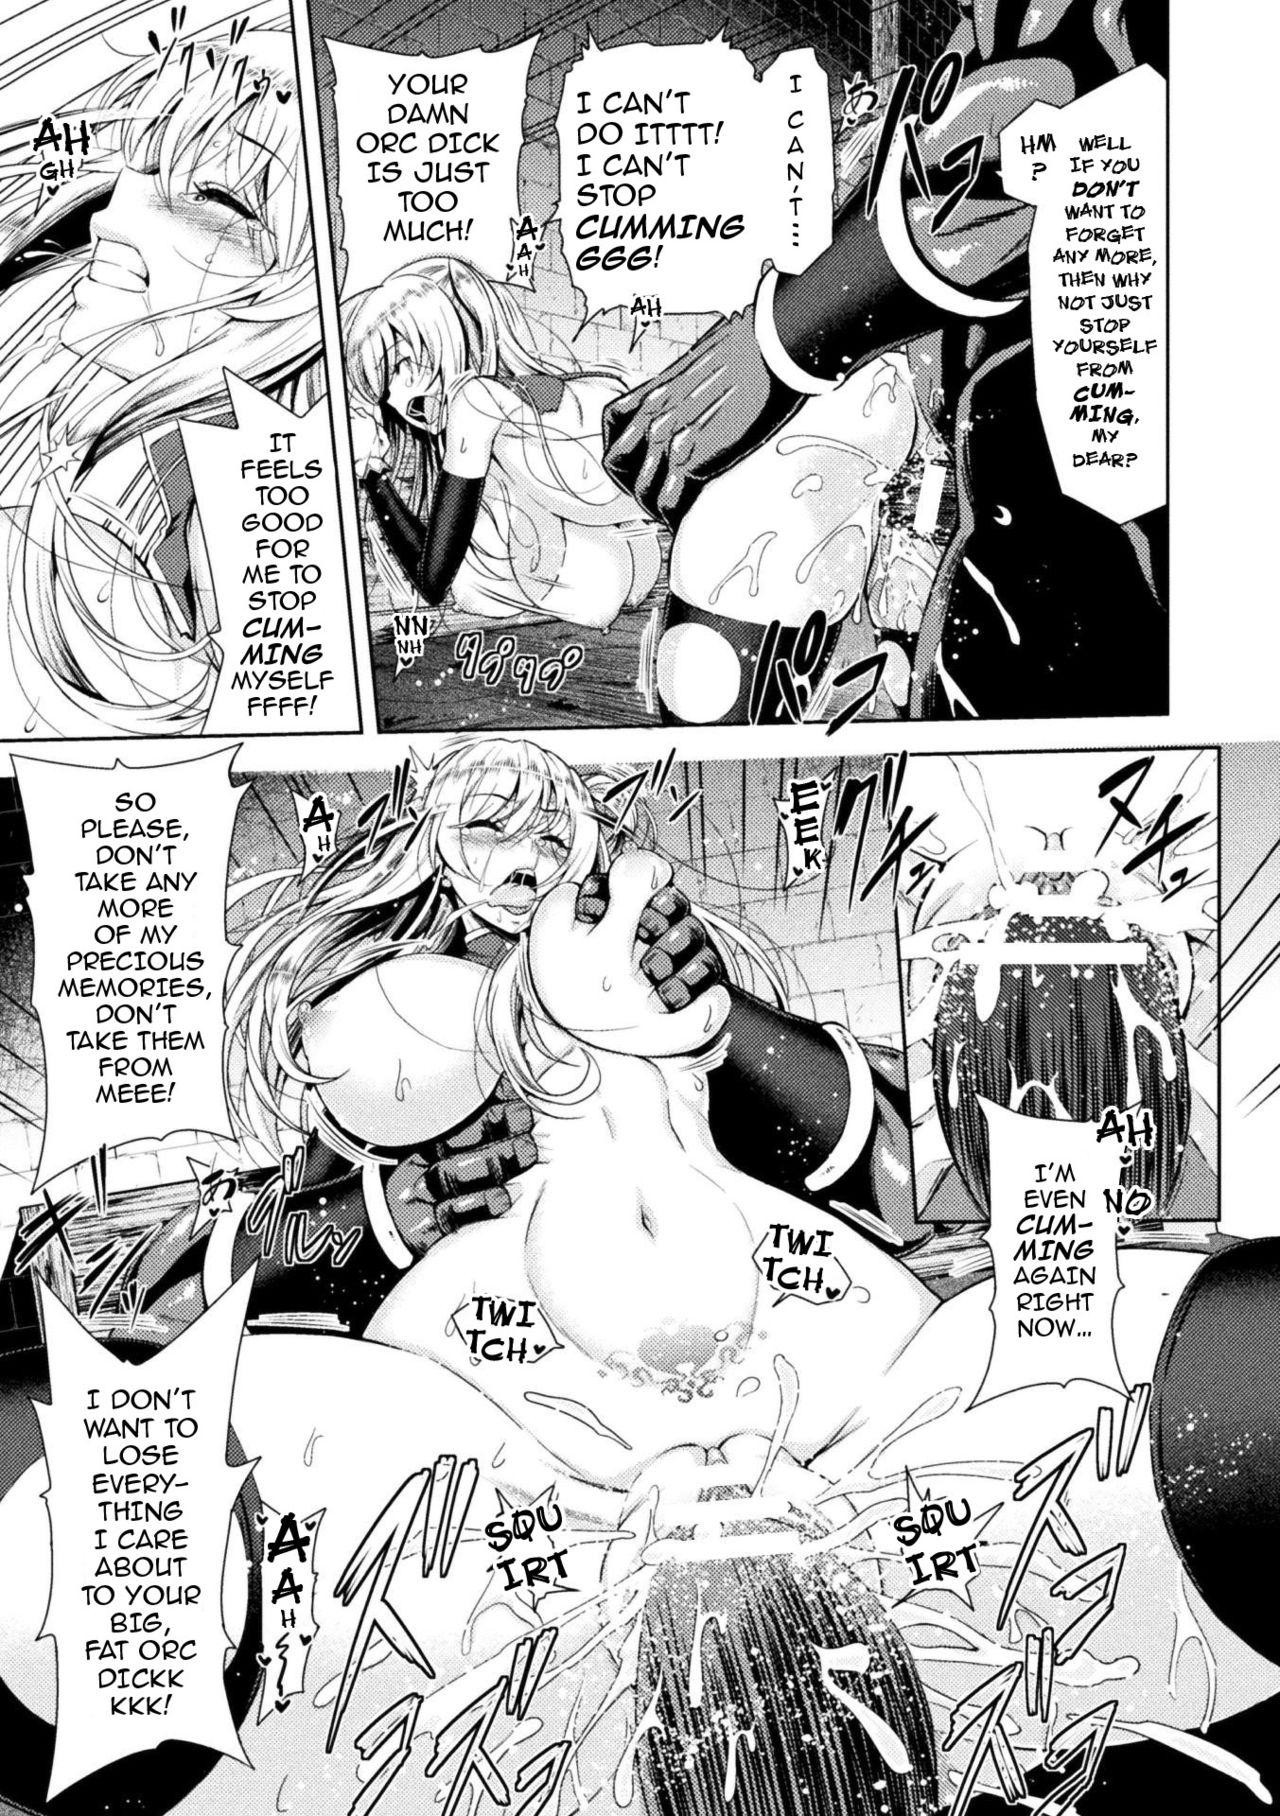 [Yamada Gogogo] Erona ~Orc no Inmon ni Okasareta Onna Kishi no Matsuro~ | Erona ~The Fall of a Beautiful Knight Cursed with the Lewd Mark of an Orc~ Ch. 1-3 [English] {darknight} 46